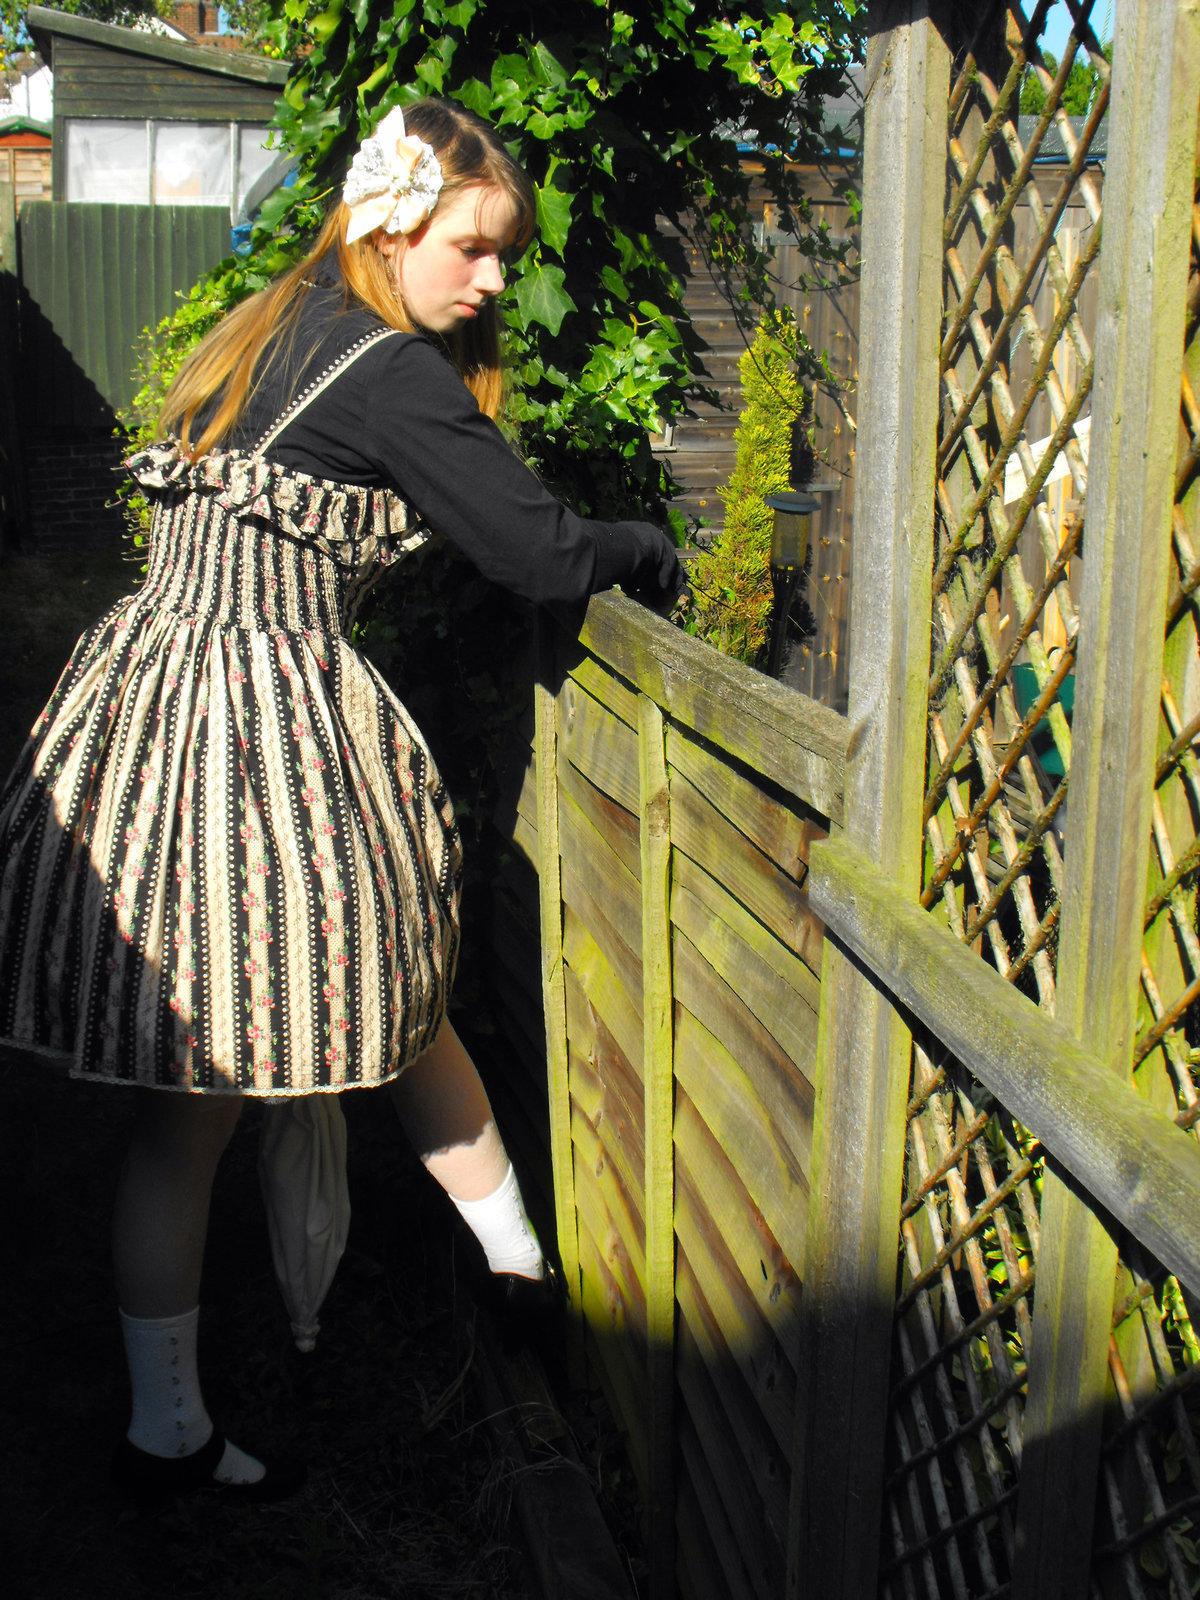 Diy Classic Lolita Look · How To Make A Pinafore Dress ...